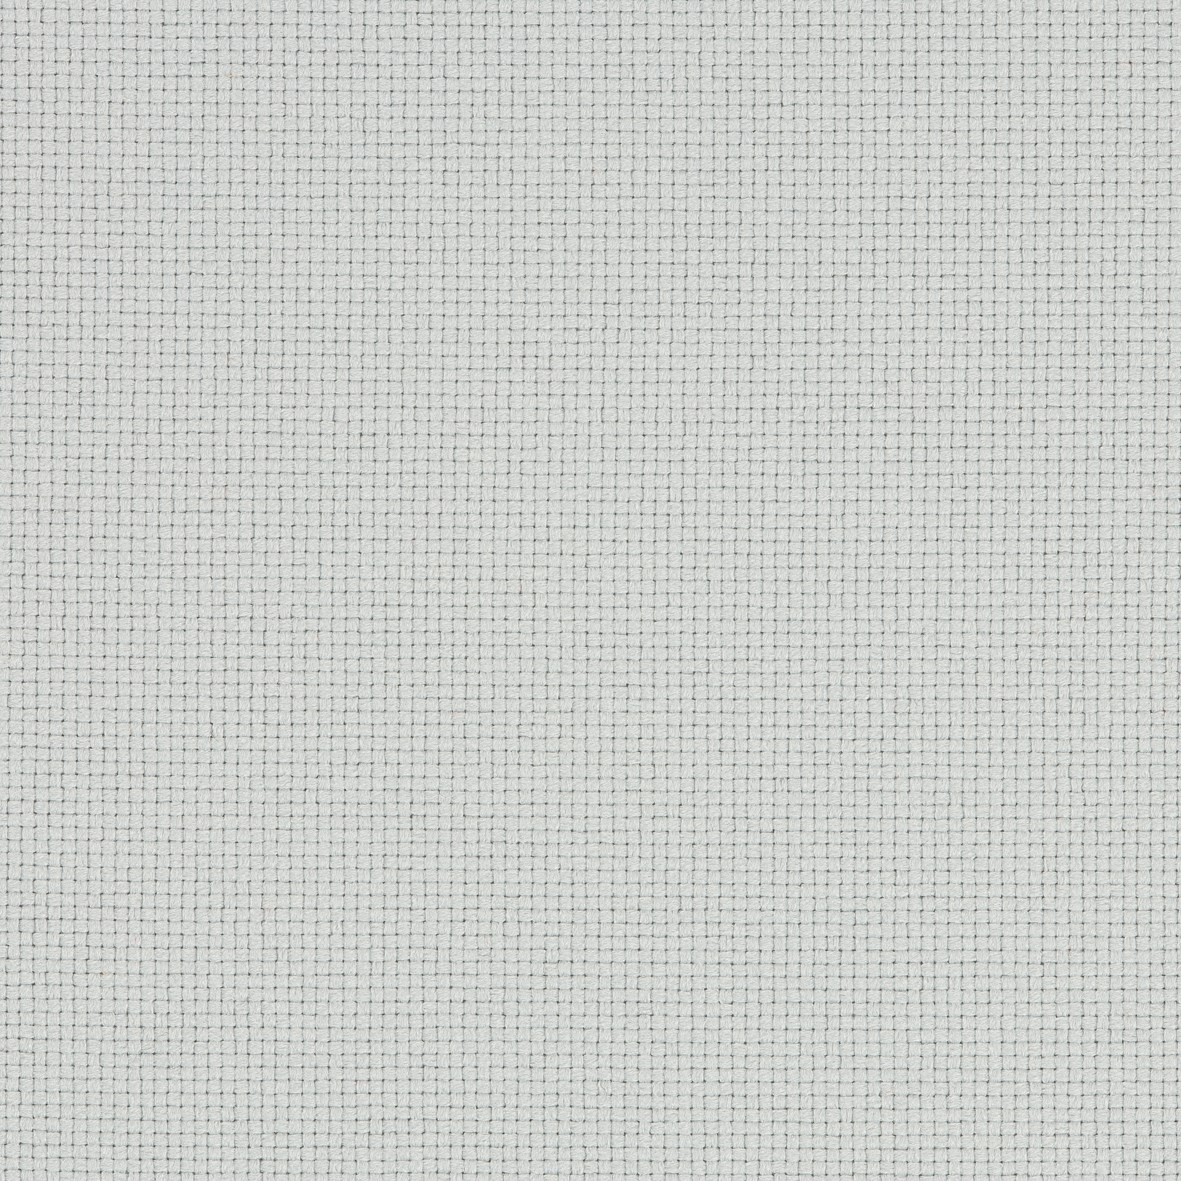 30x12cm M/étal Sac /À Main Cadre Carr/é De Fer Sac /À Main Poign/ée Portefeuille Cadre pour DIY Pi/èce Sac Bourse Cadre Baiser Fermoir Serrure DIY Artisanat